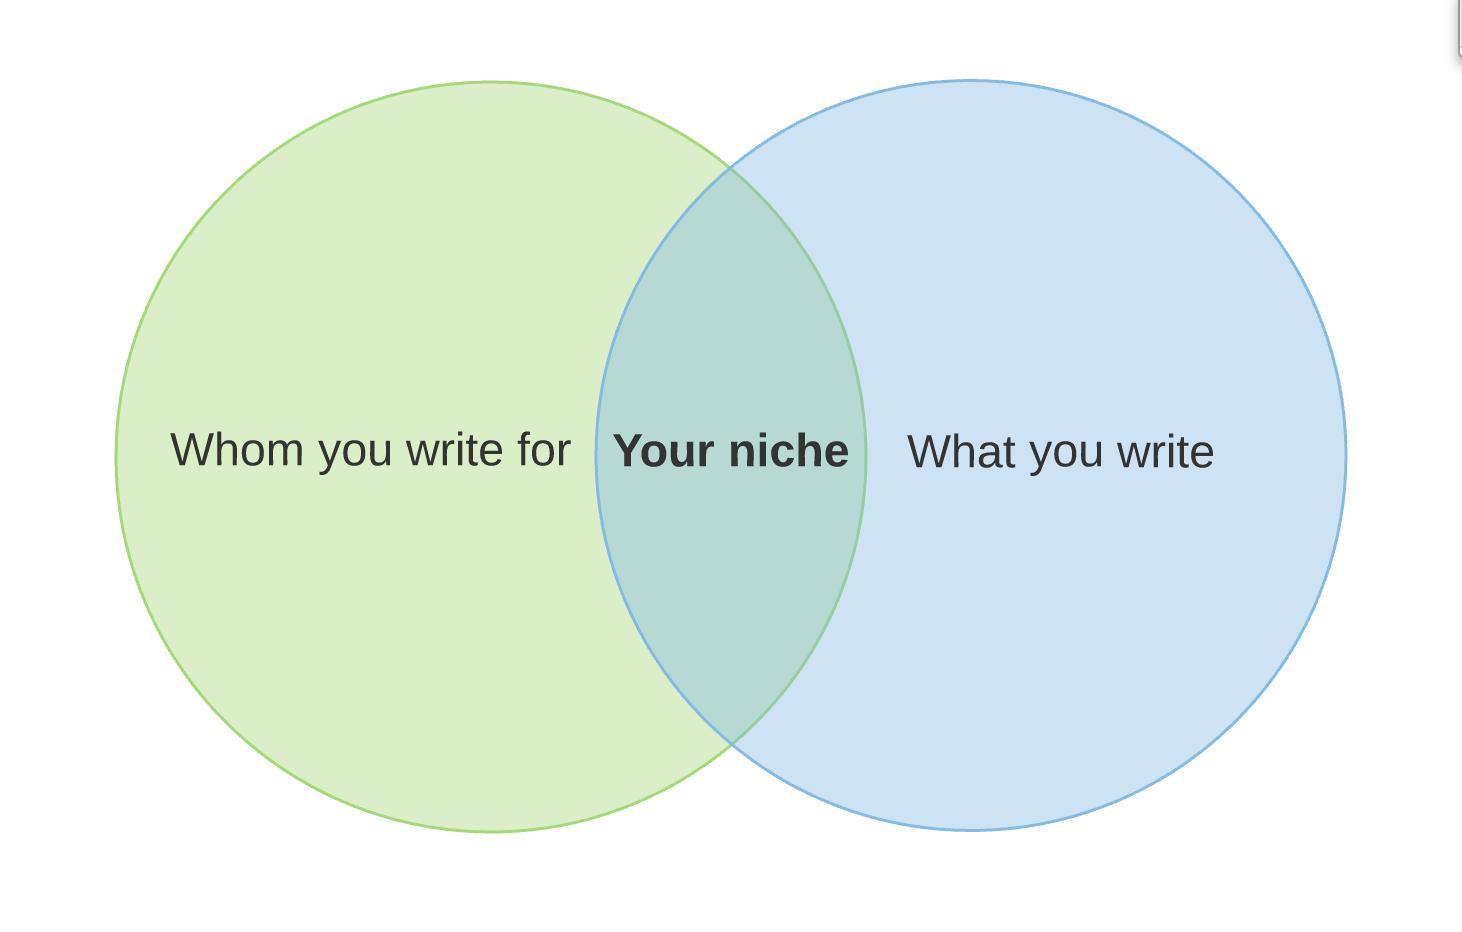 Venn Diagram for Your niche